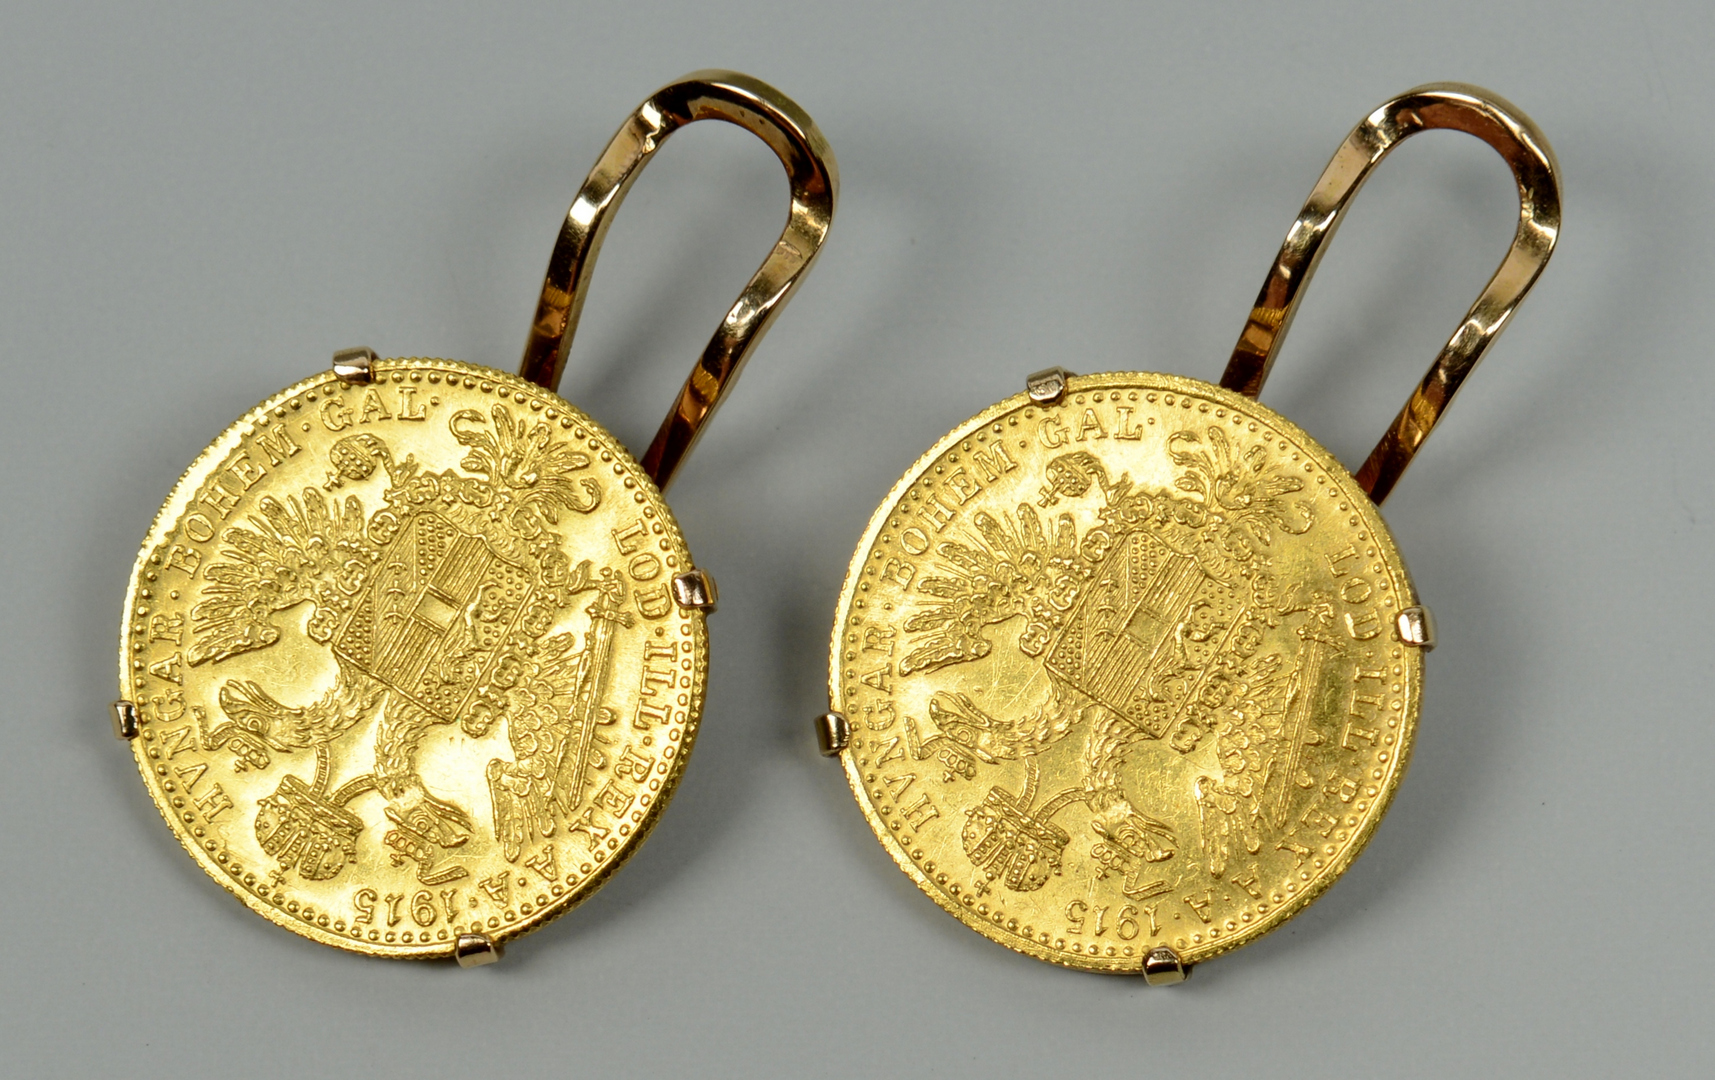 Lot 3088071: 3 1915 Austrian Ducat Coin Jewelry Items